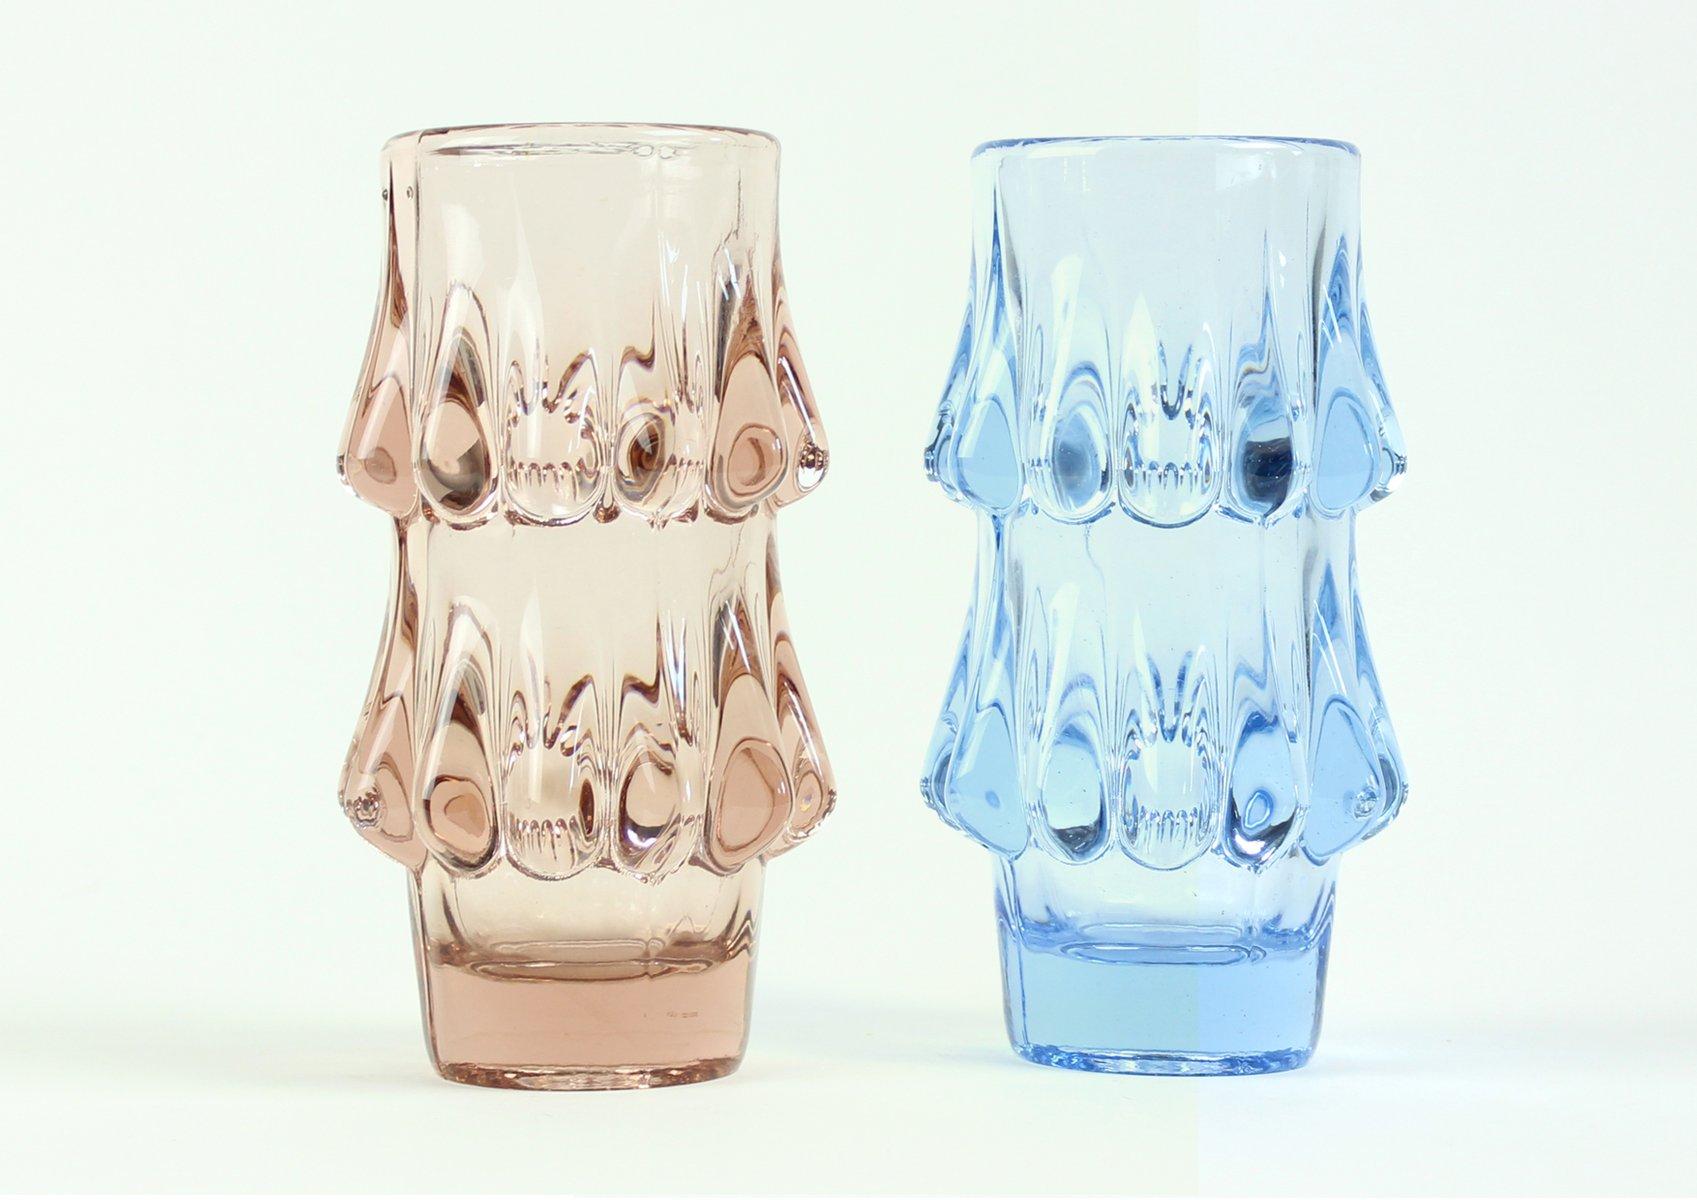 Vintage pink blue glass vases by jiri brabec for sklo union vintage pink blue glass vases by jiri brabec for sklo union rosice 1978 set of 2 for sale at pamono reviewsmspy